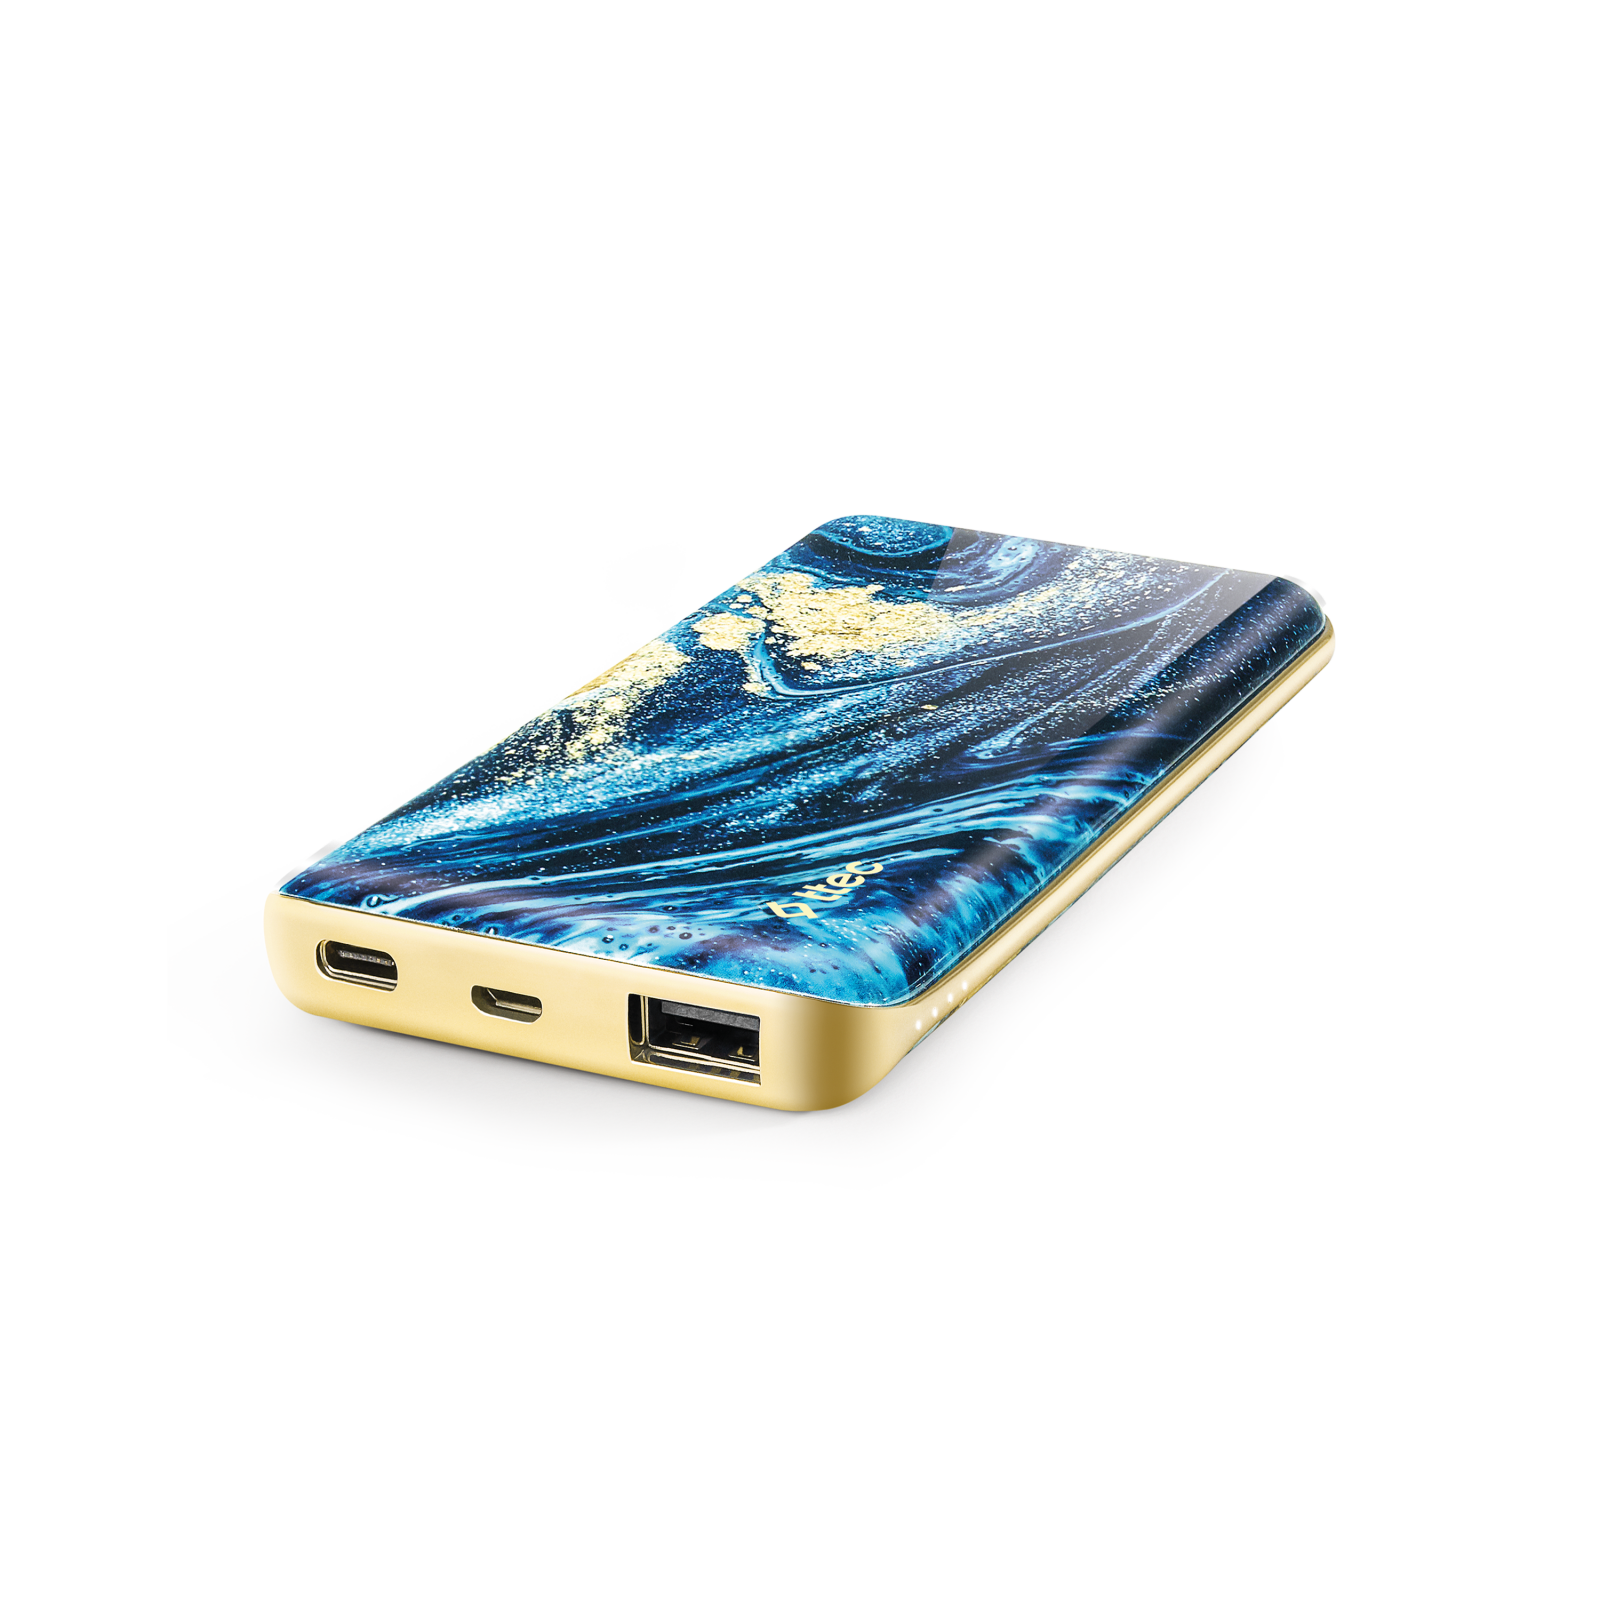 Външна батерия ArtPower Universal Mobile Charger 8.000 mAh,  Blue Marble,116269